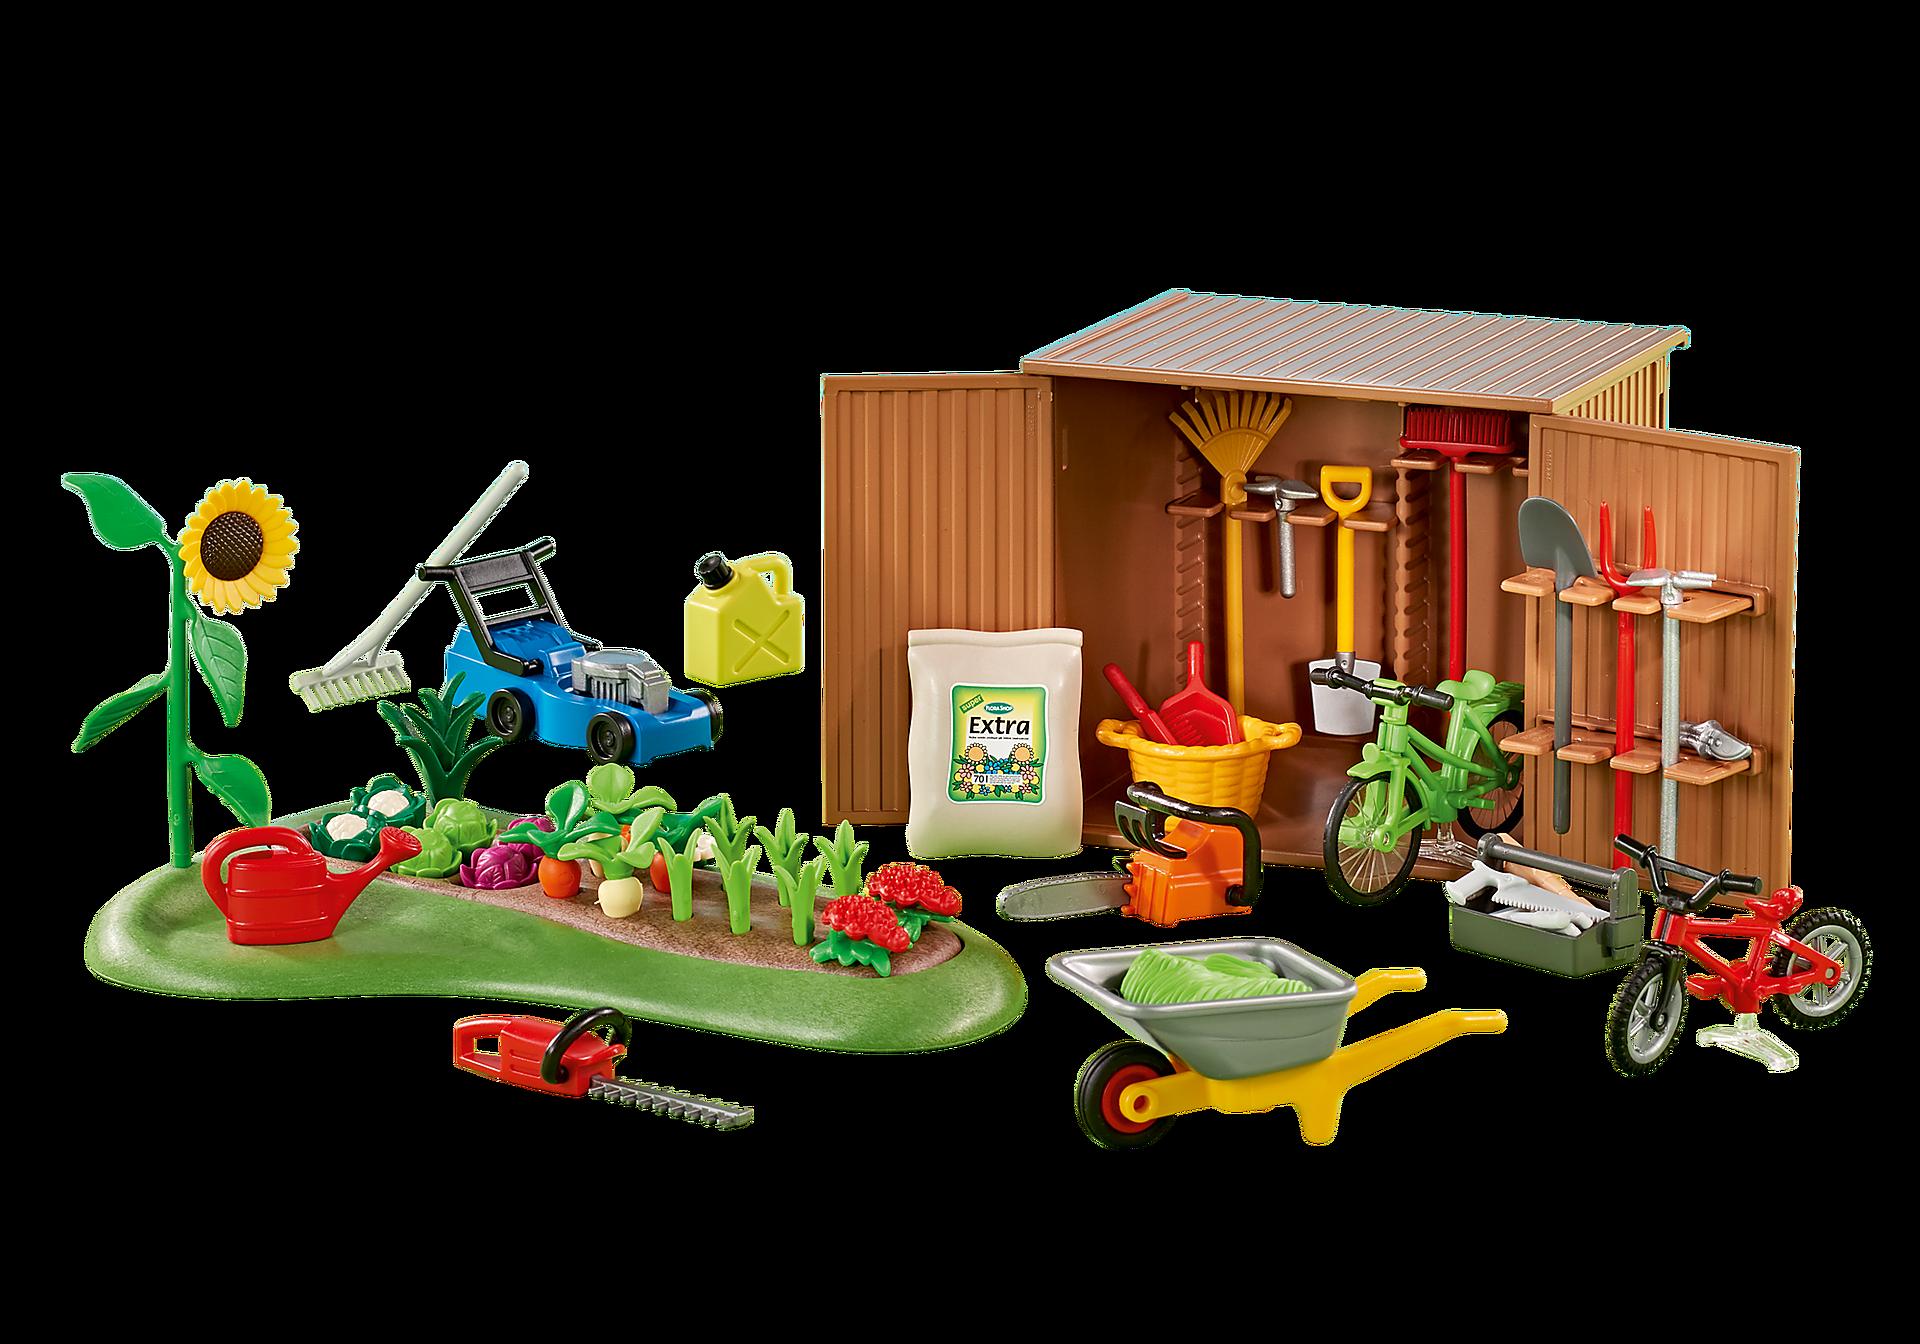 http://media.playmobil.com/i/playmobil/6558_product_detail/Caseta de Jardín